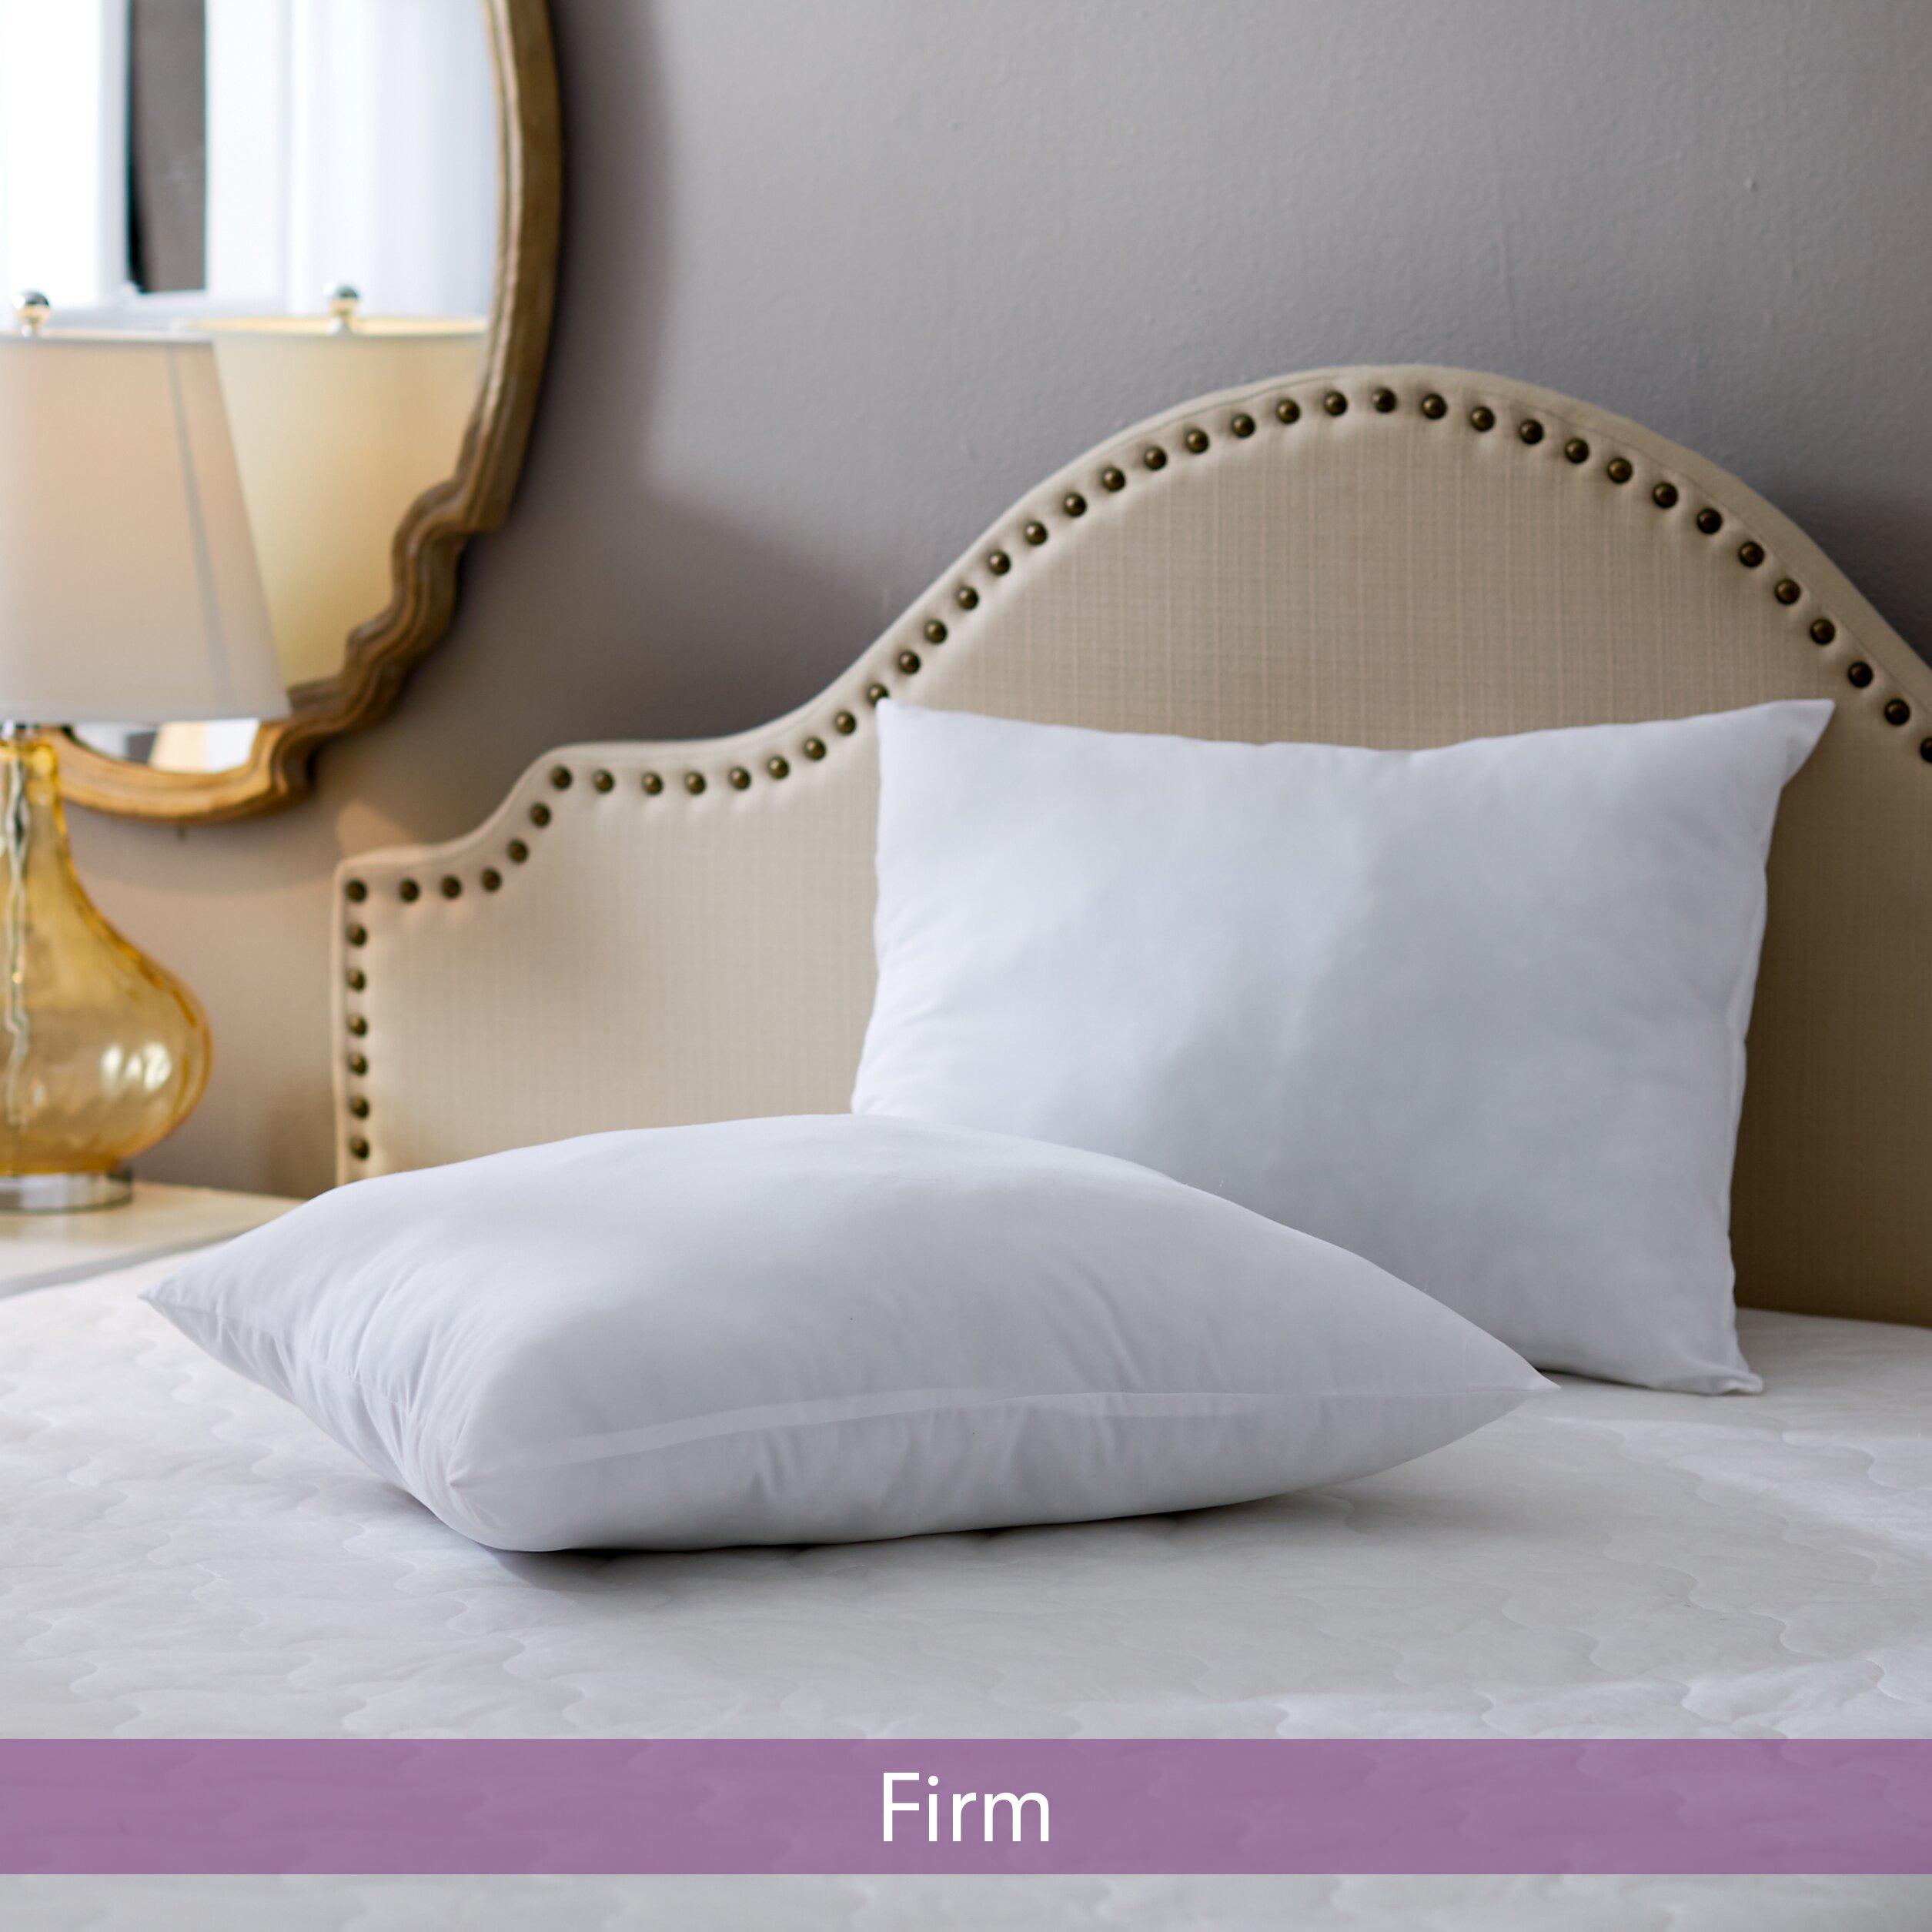 Wayfair Sleep Wayfair Sleep Firm Pillow Amp Reviews Wayfair Ca